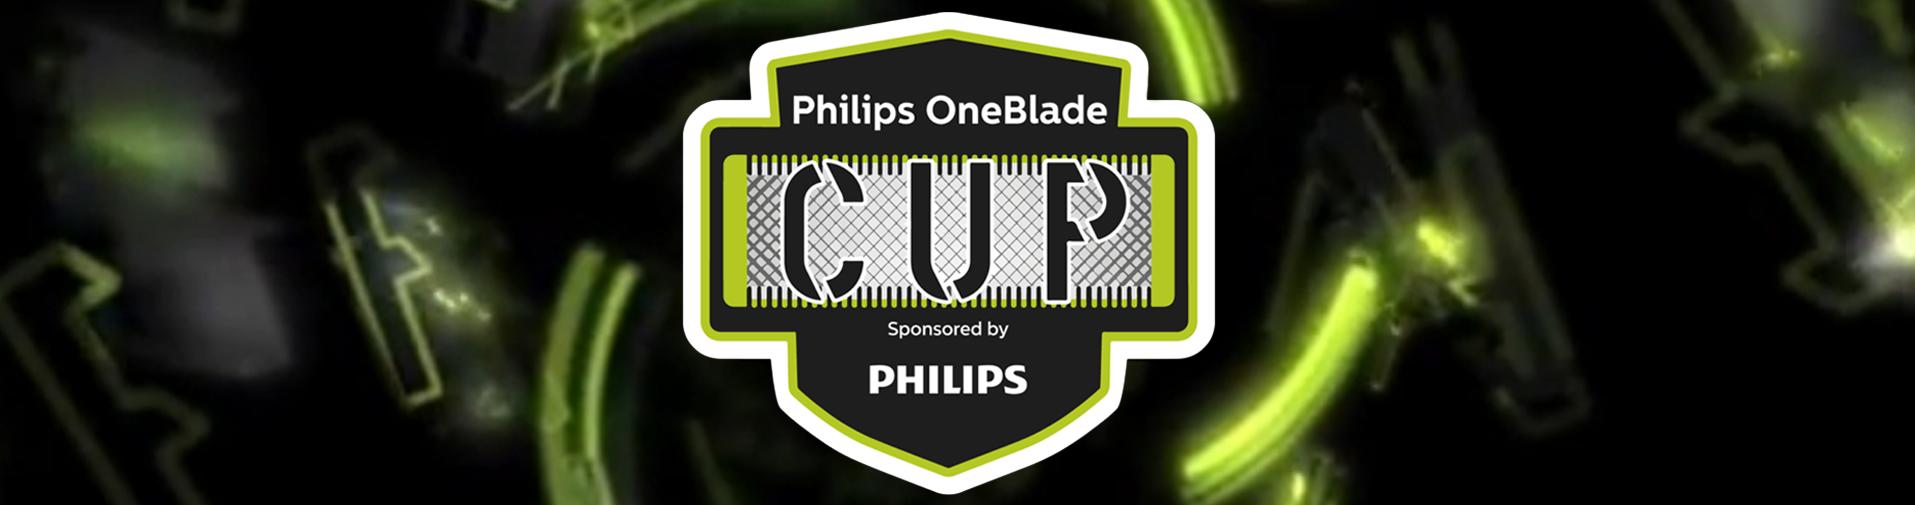 Philips OneBlade Cup FIFA 21